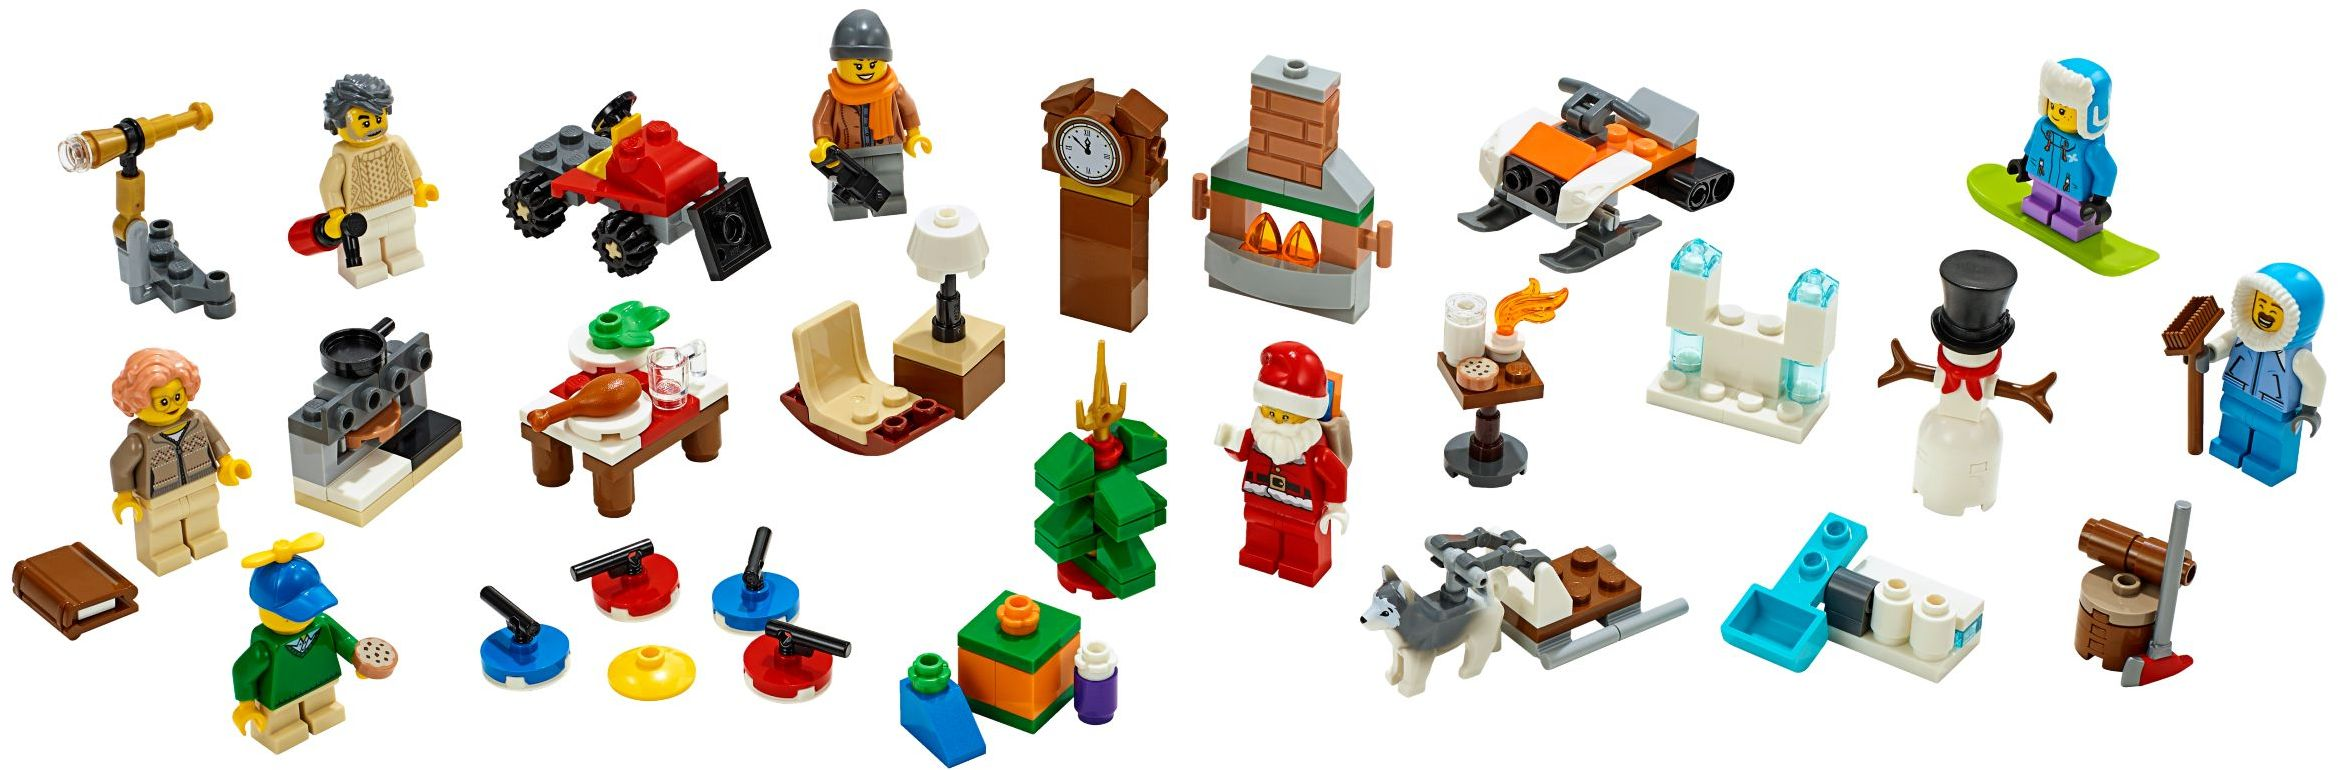 2 children /& accessories new Lego ® city polybag figurine snowman